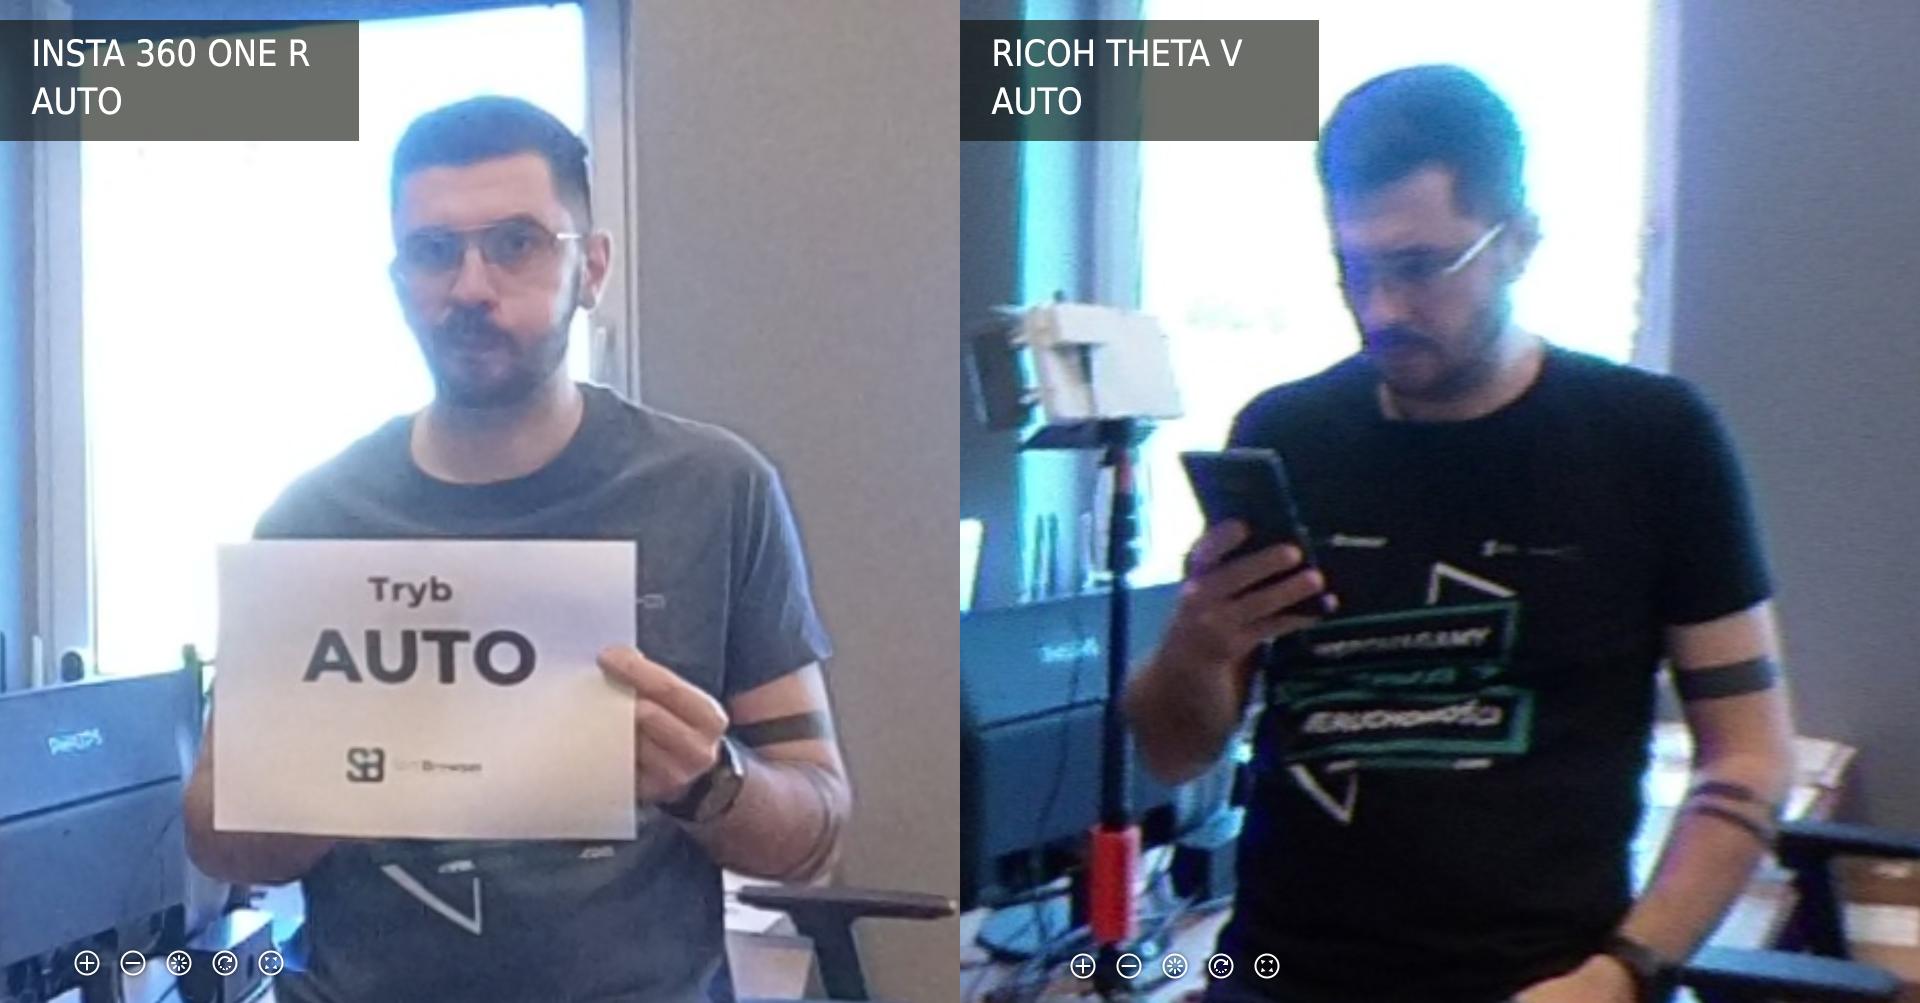 Ricoh Theta V vs Insta 360 One R tryb Auto